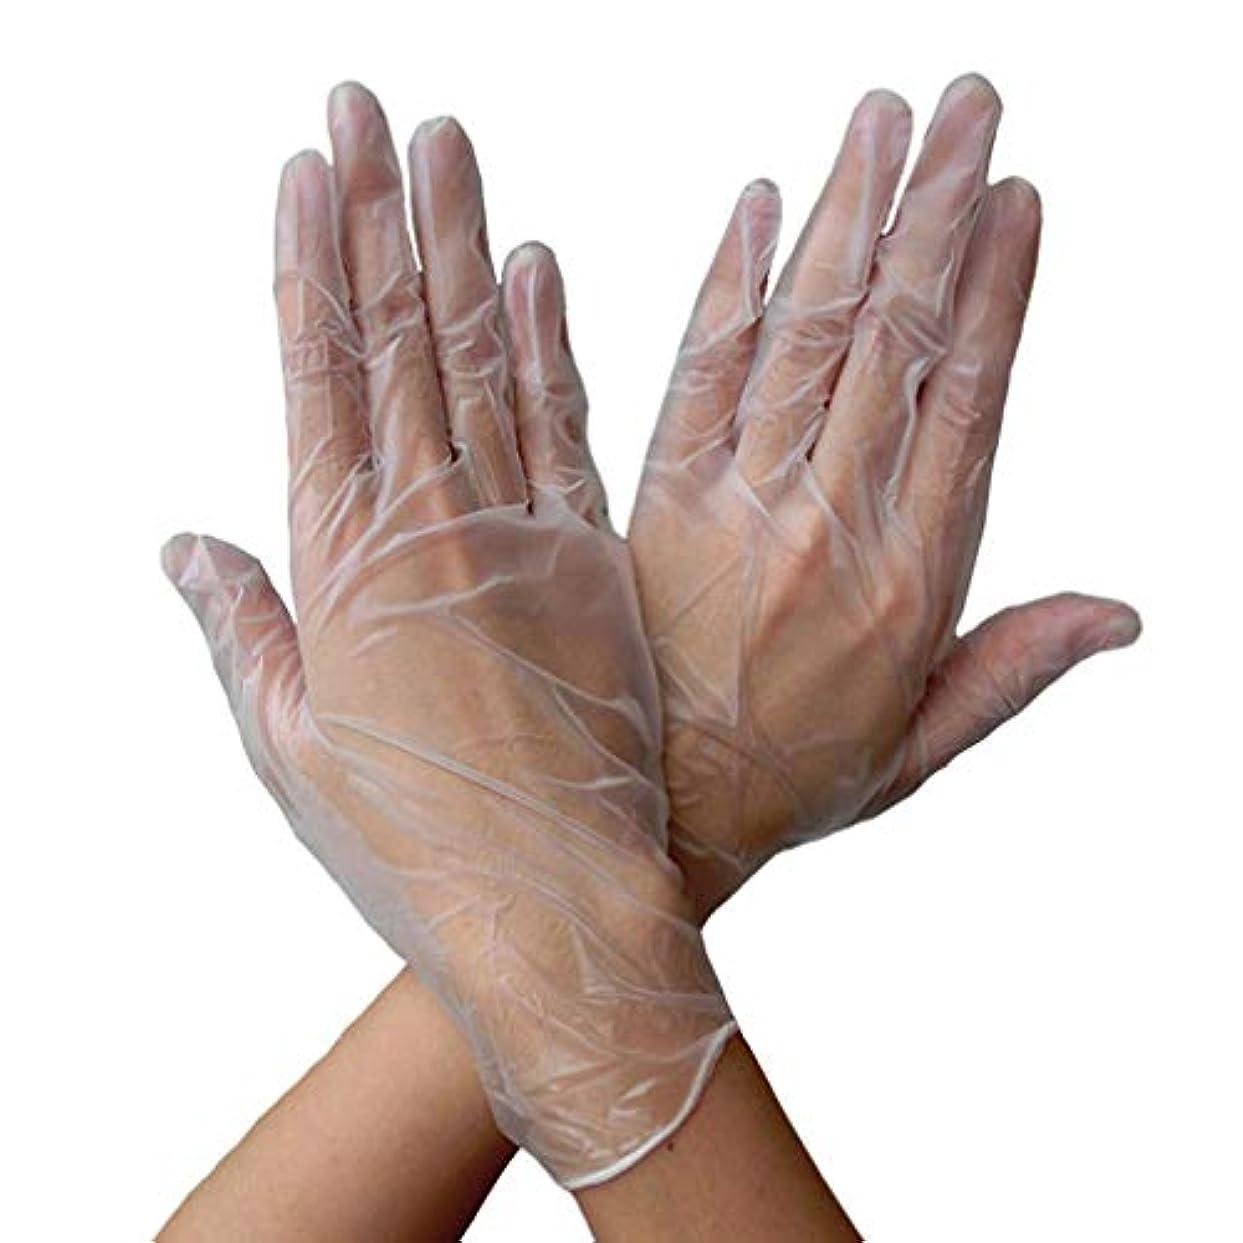 Honel 使い捨て手袋 タトゥー/歯科/病院/研究室に適応 薄い PVC 手袋 高耐久 ホワイト 両手用 使い捨て手袋 50枚 ホワイト L